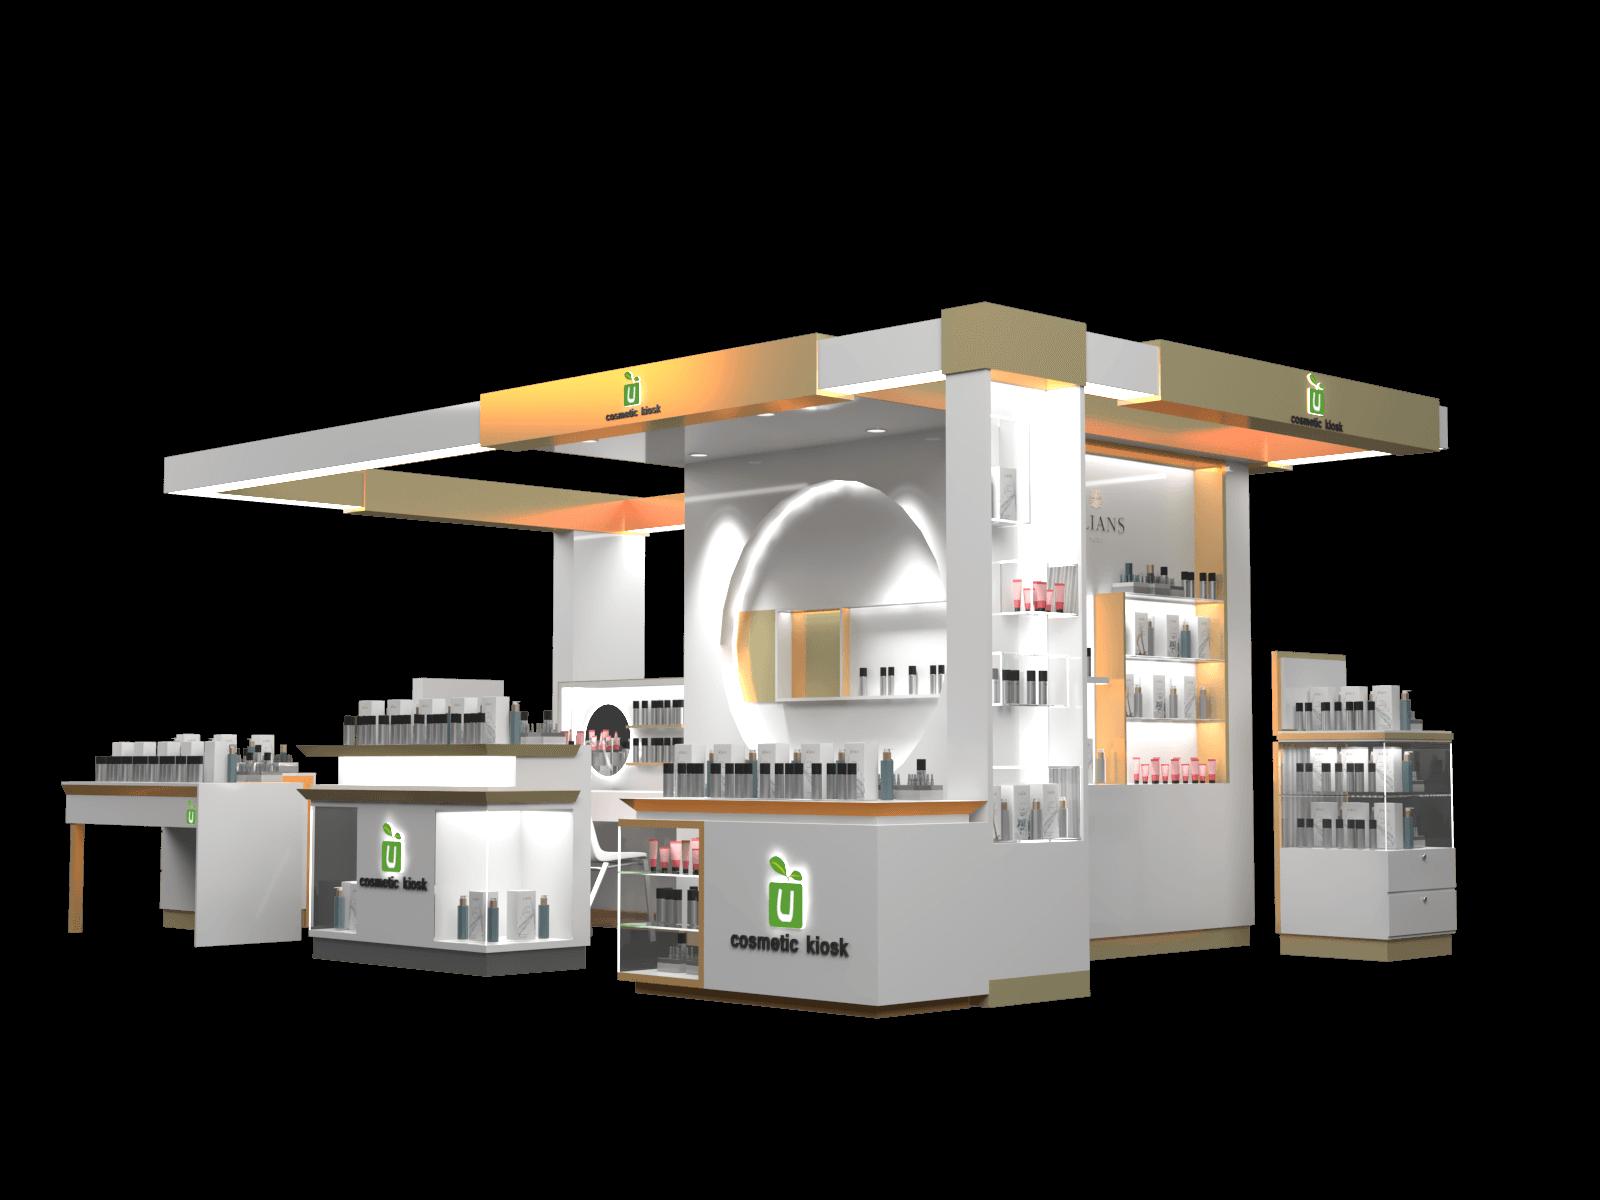 cosmetic kiosk